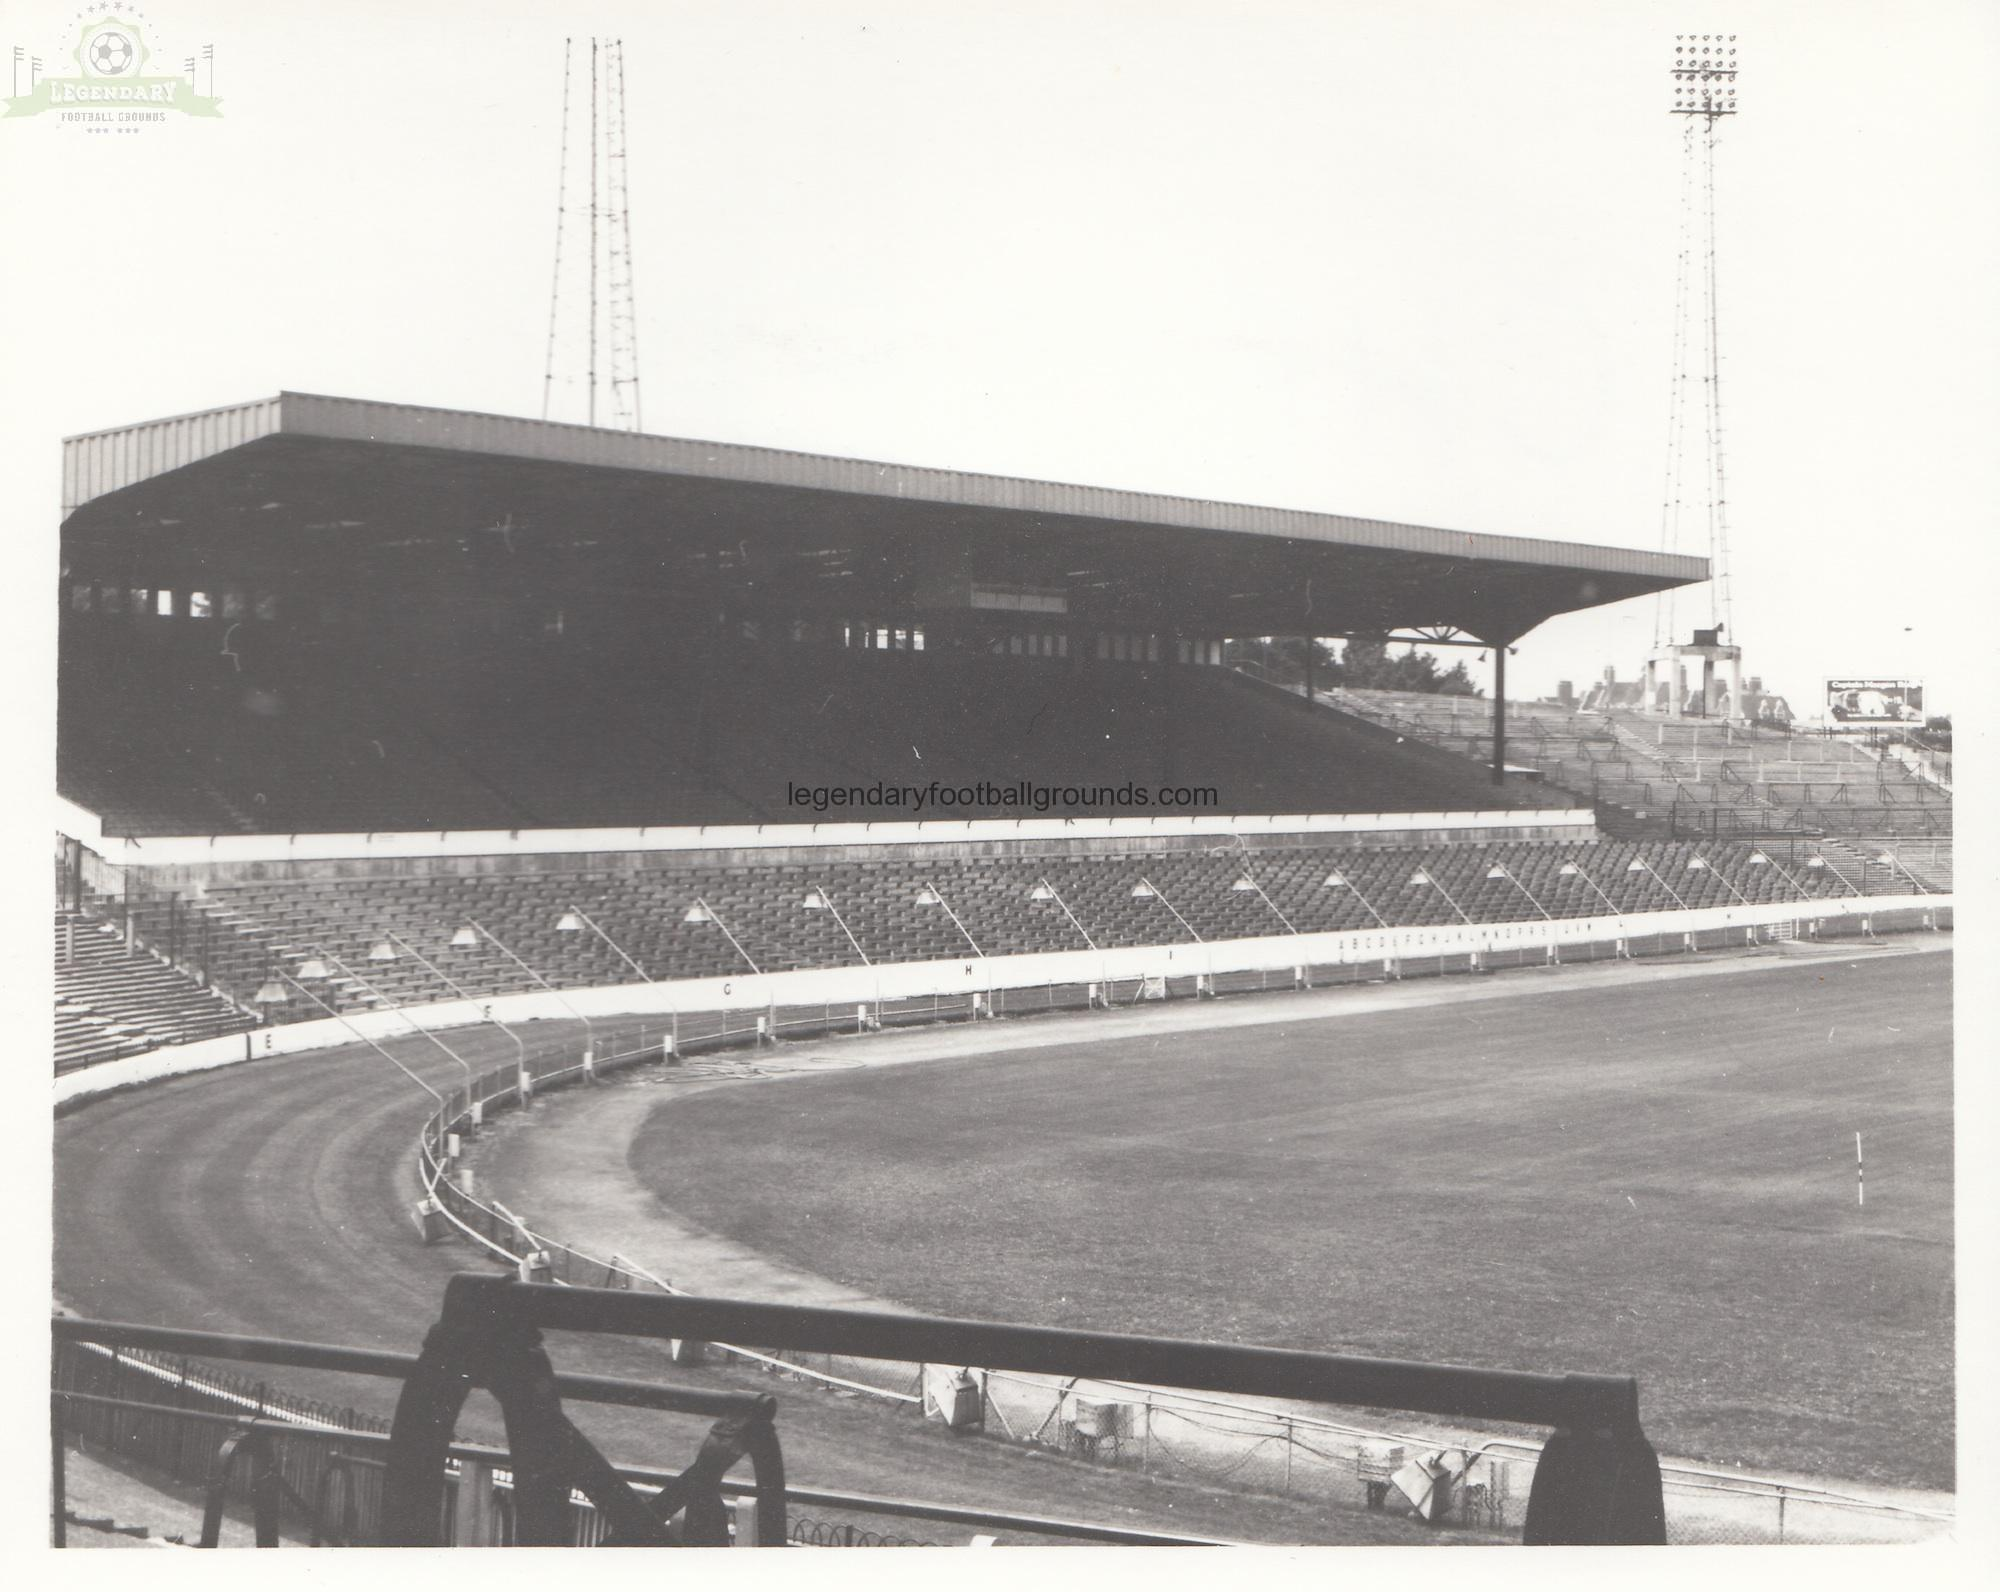 BIG Chelsea - Stamford Bridge - West Stand 1 - August 1969